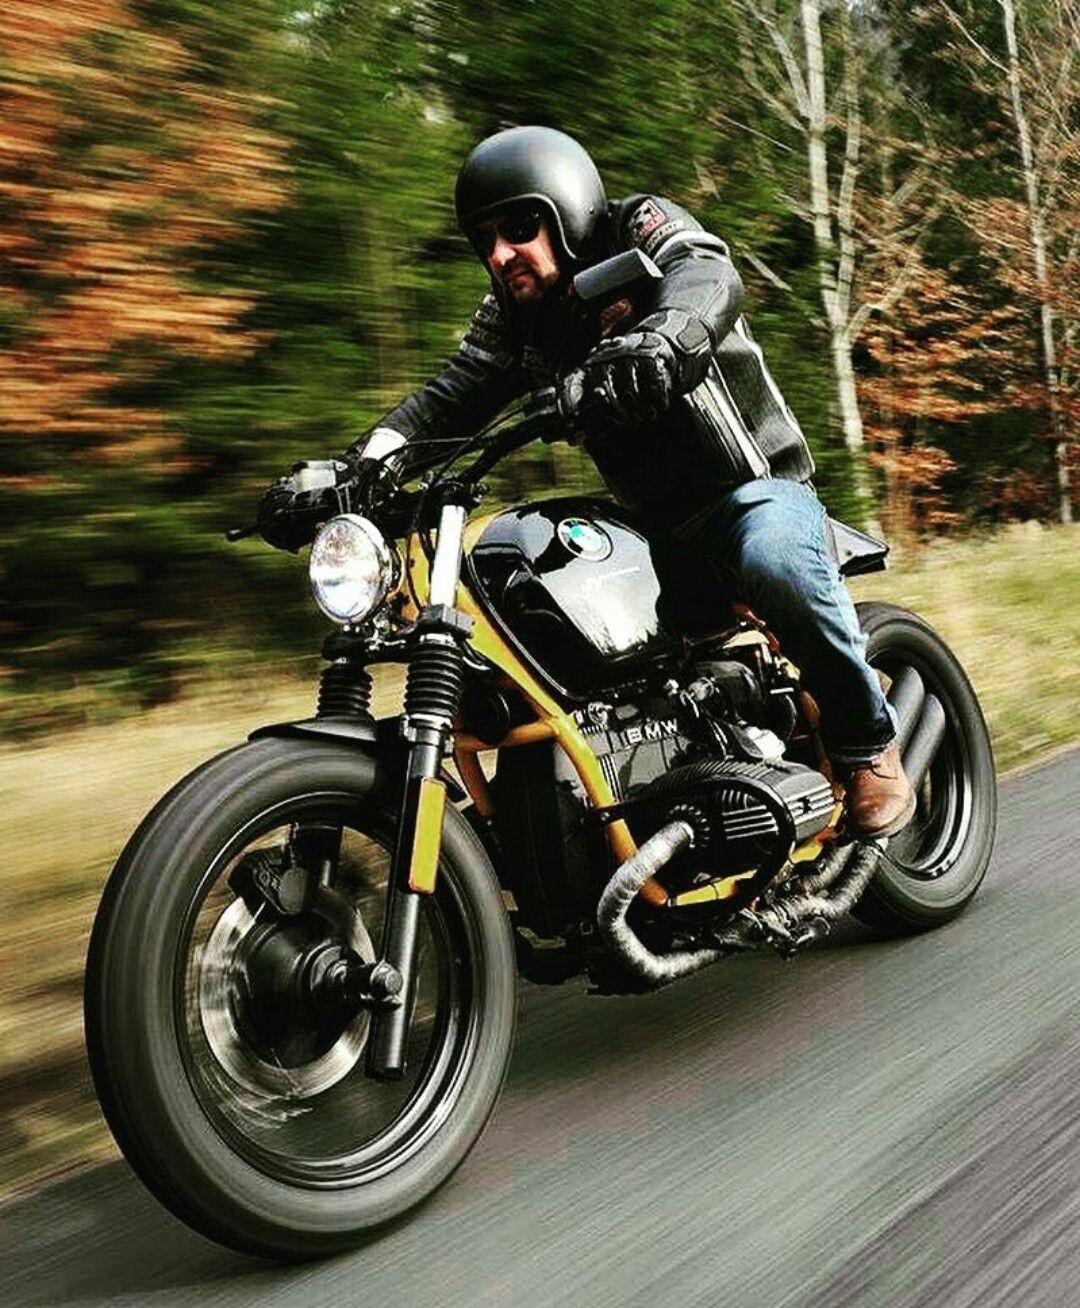 bmw custom cafe racer bike bmw motorrad bmw und motorrad. Black Bedroom Furniture Sets. Home Design Ideas